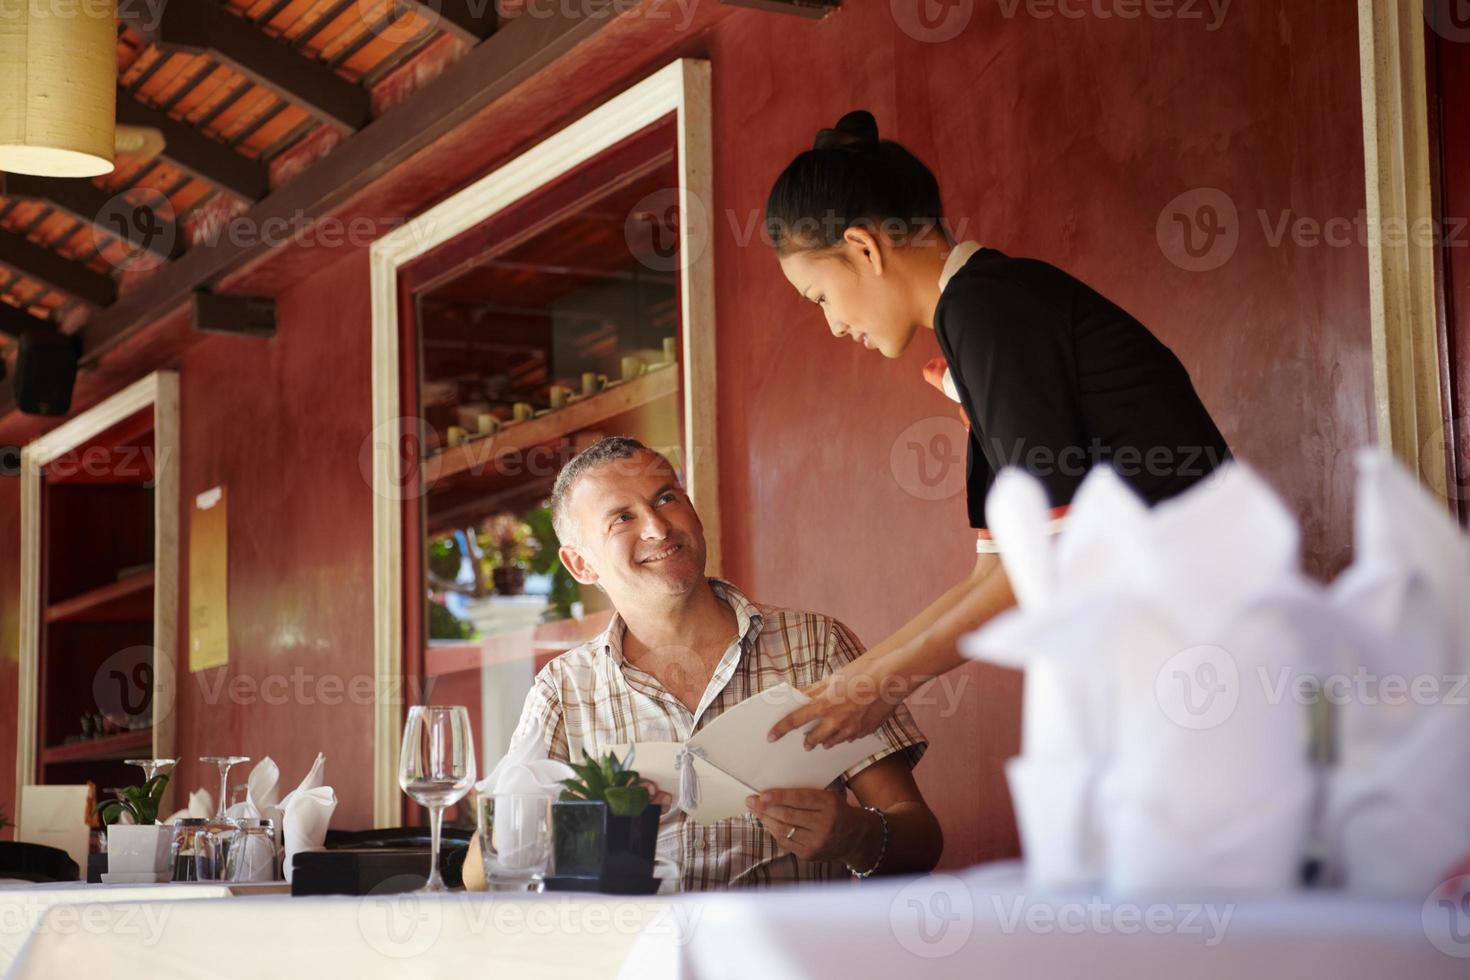 asiatisk servitris som pratar med klienten i restaurangen foto